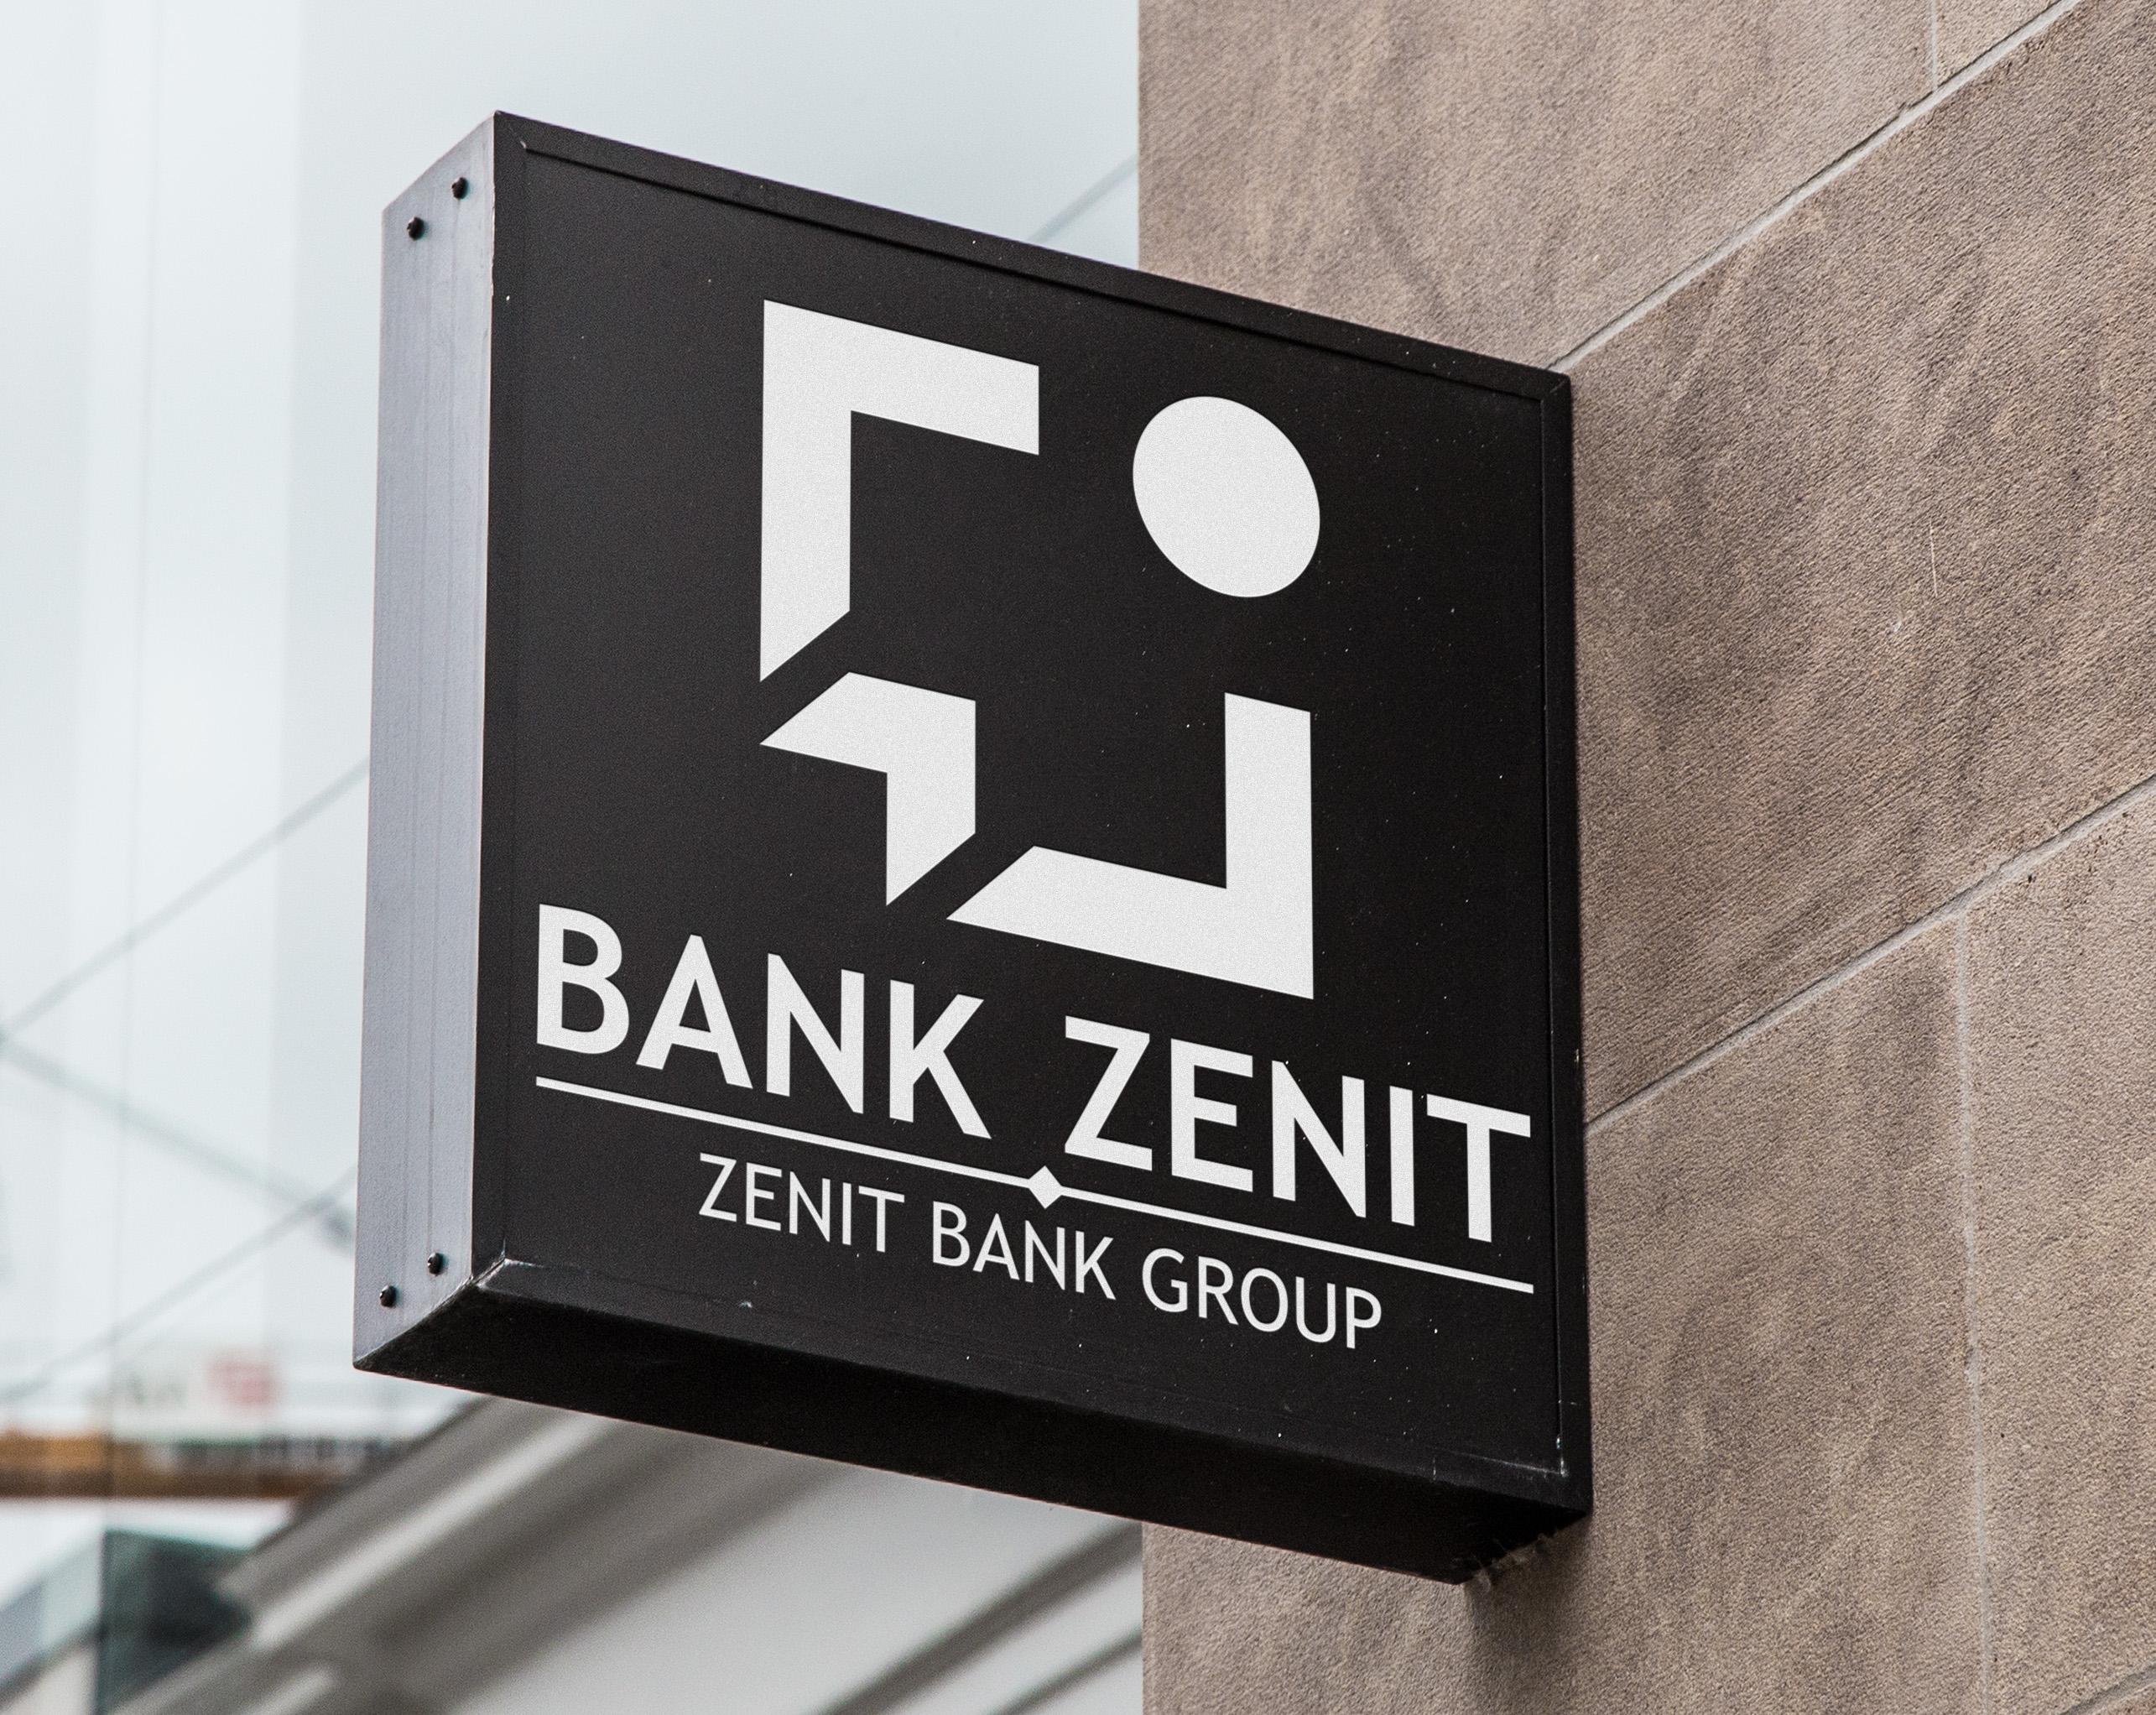 Разработка логотипа для Банка ЗЕНИТ фото f_5755b4859791fe9b.jpg